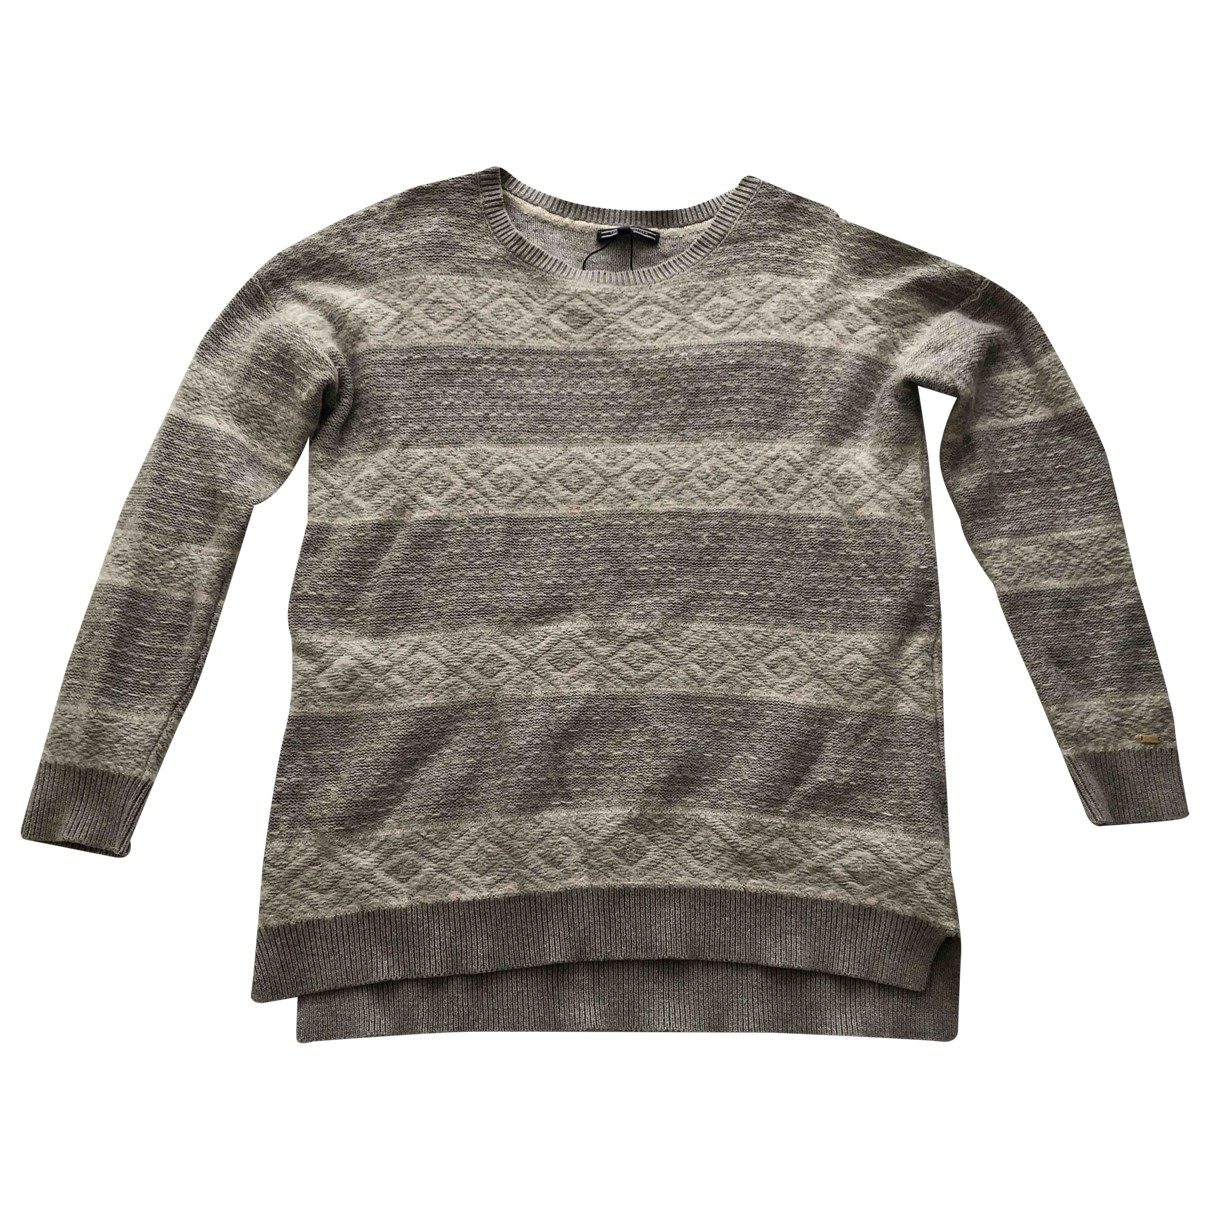 Tommy Hilfiger \N Pullover in  Grau Baumwolle